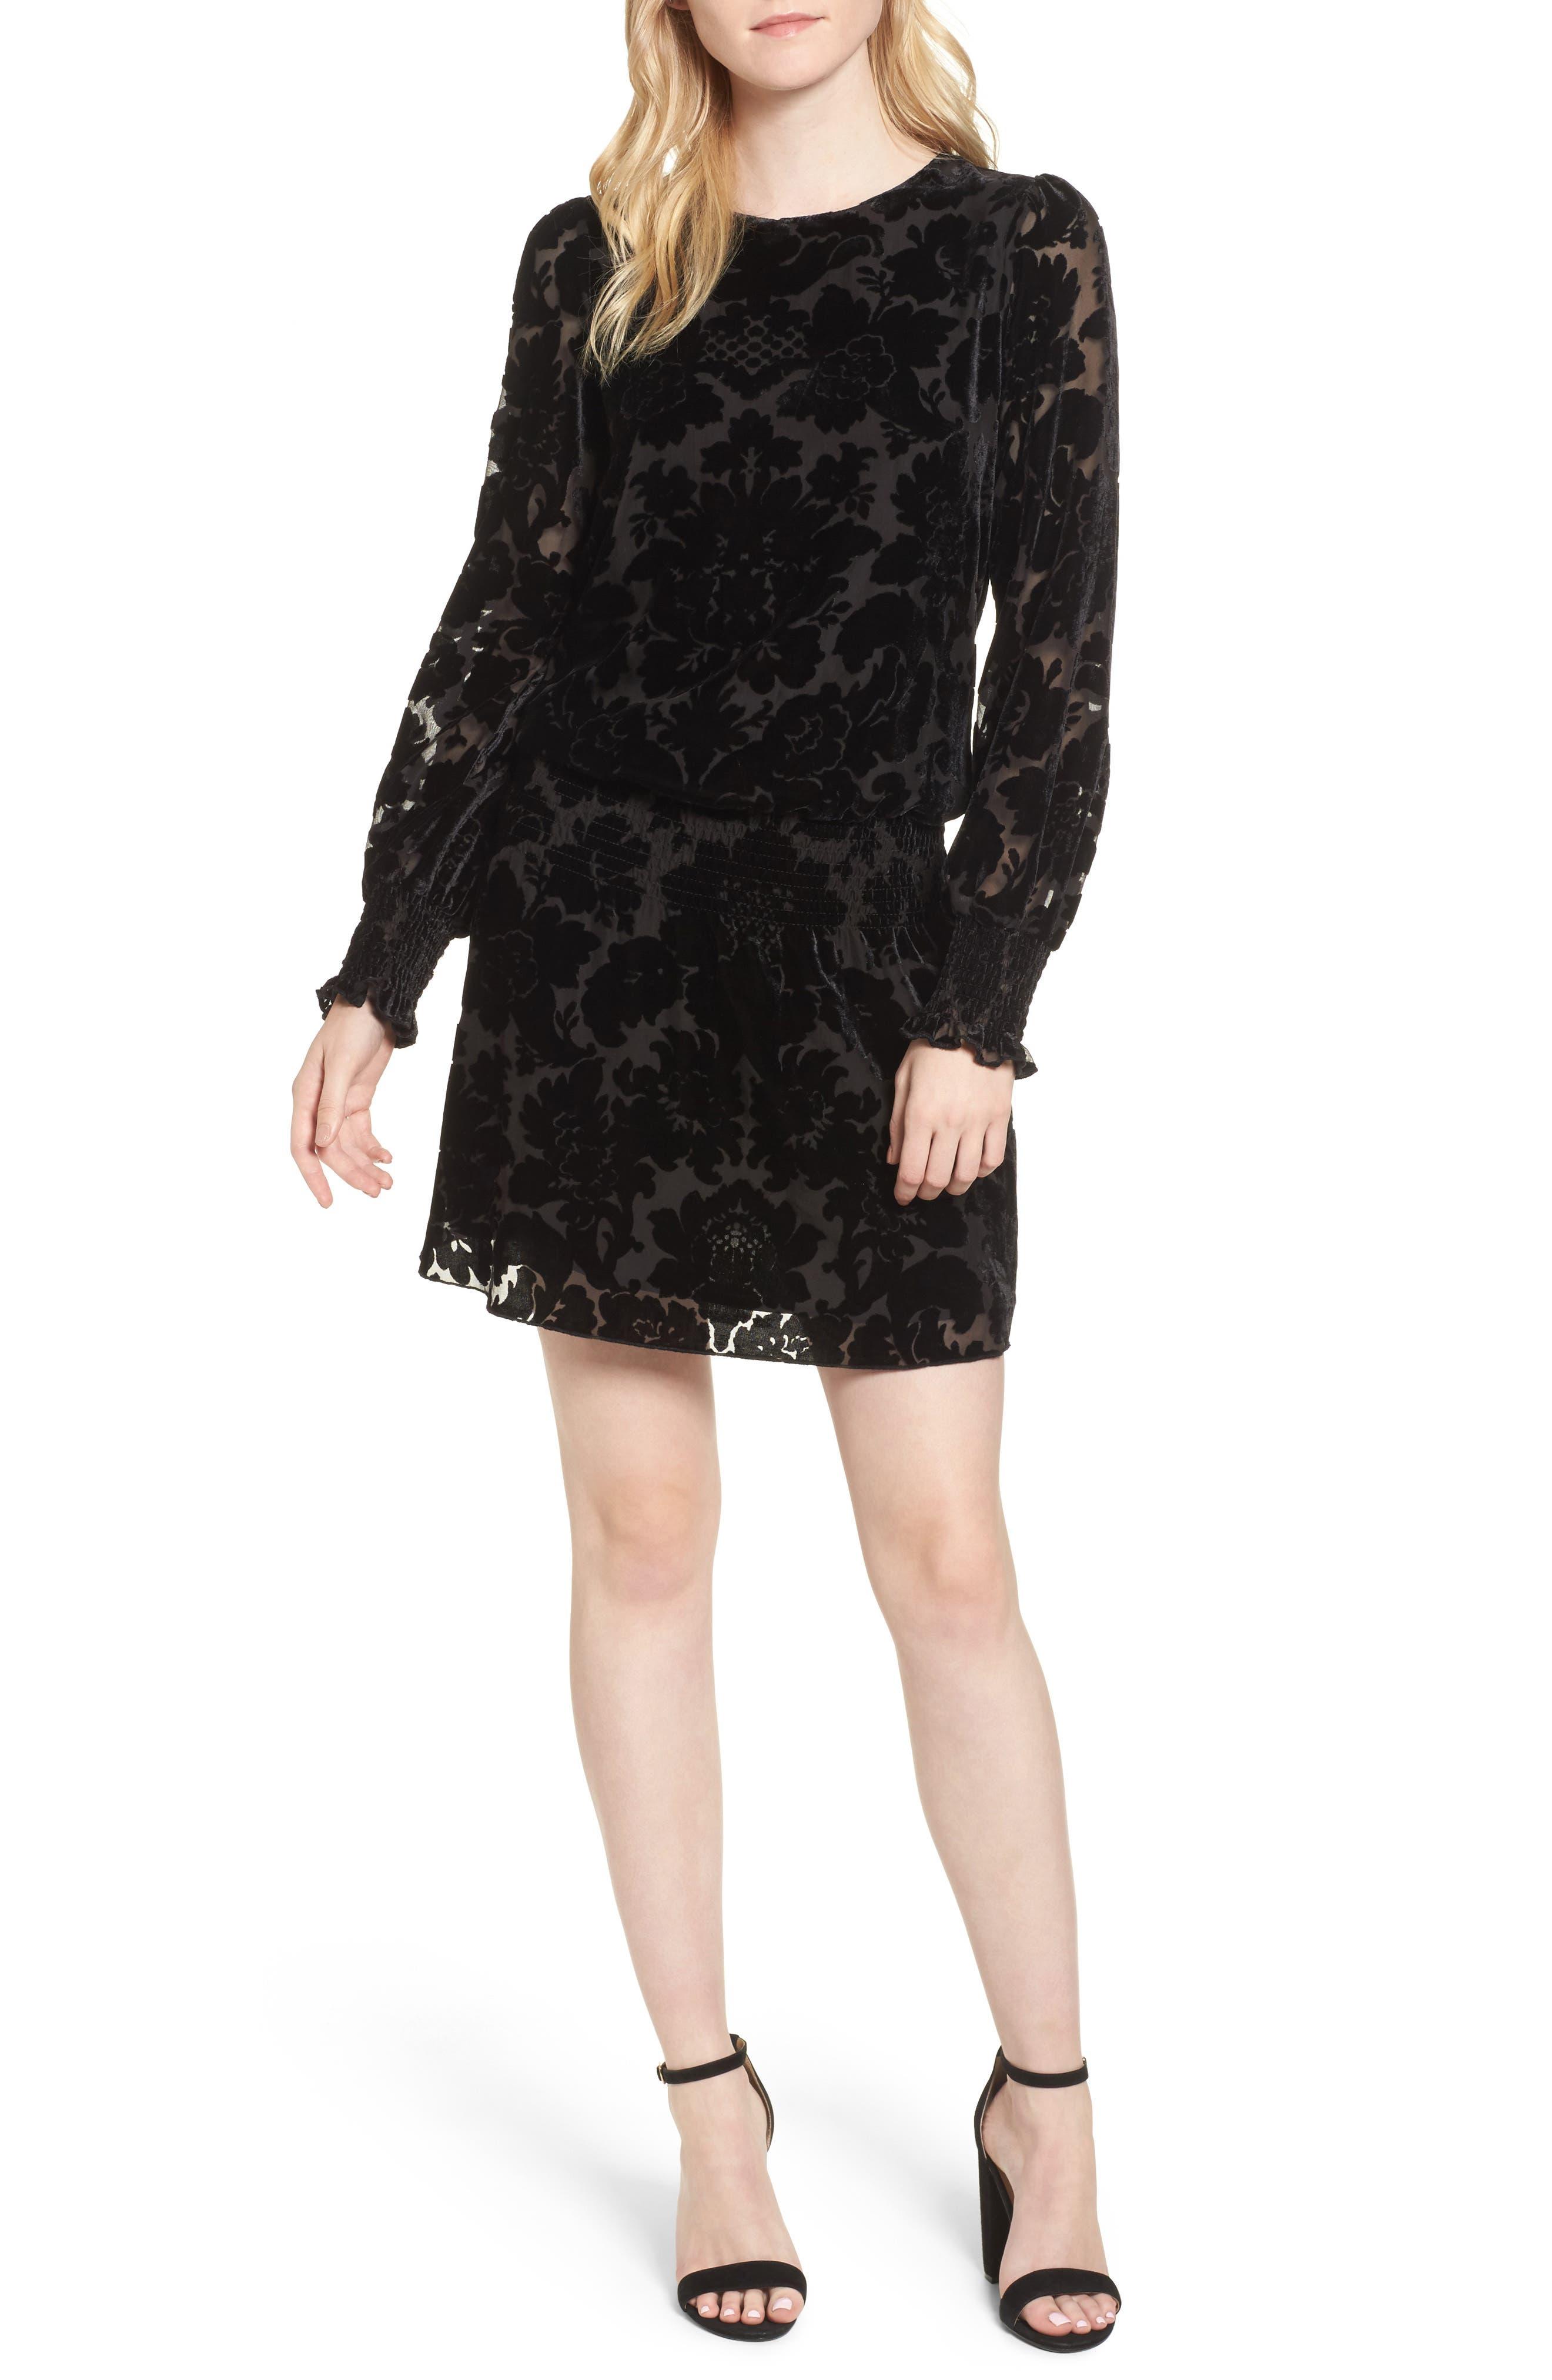 Carmindy Blouson Dress,                             Main thumbnail 1, color,                             001